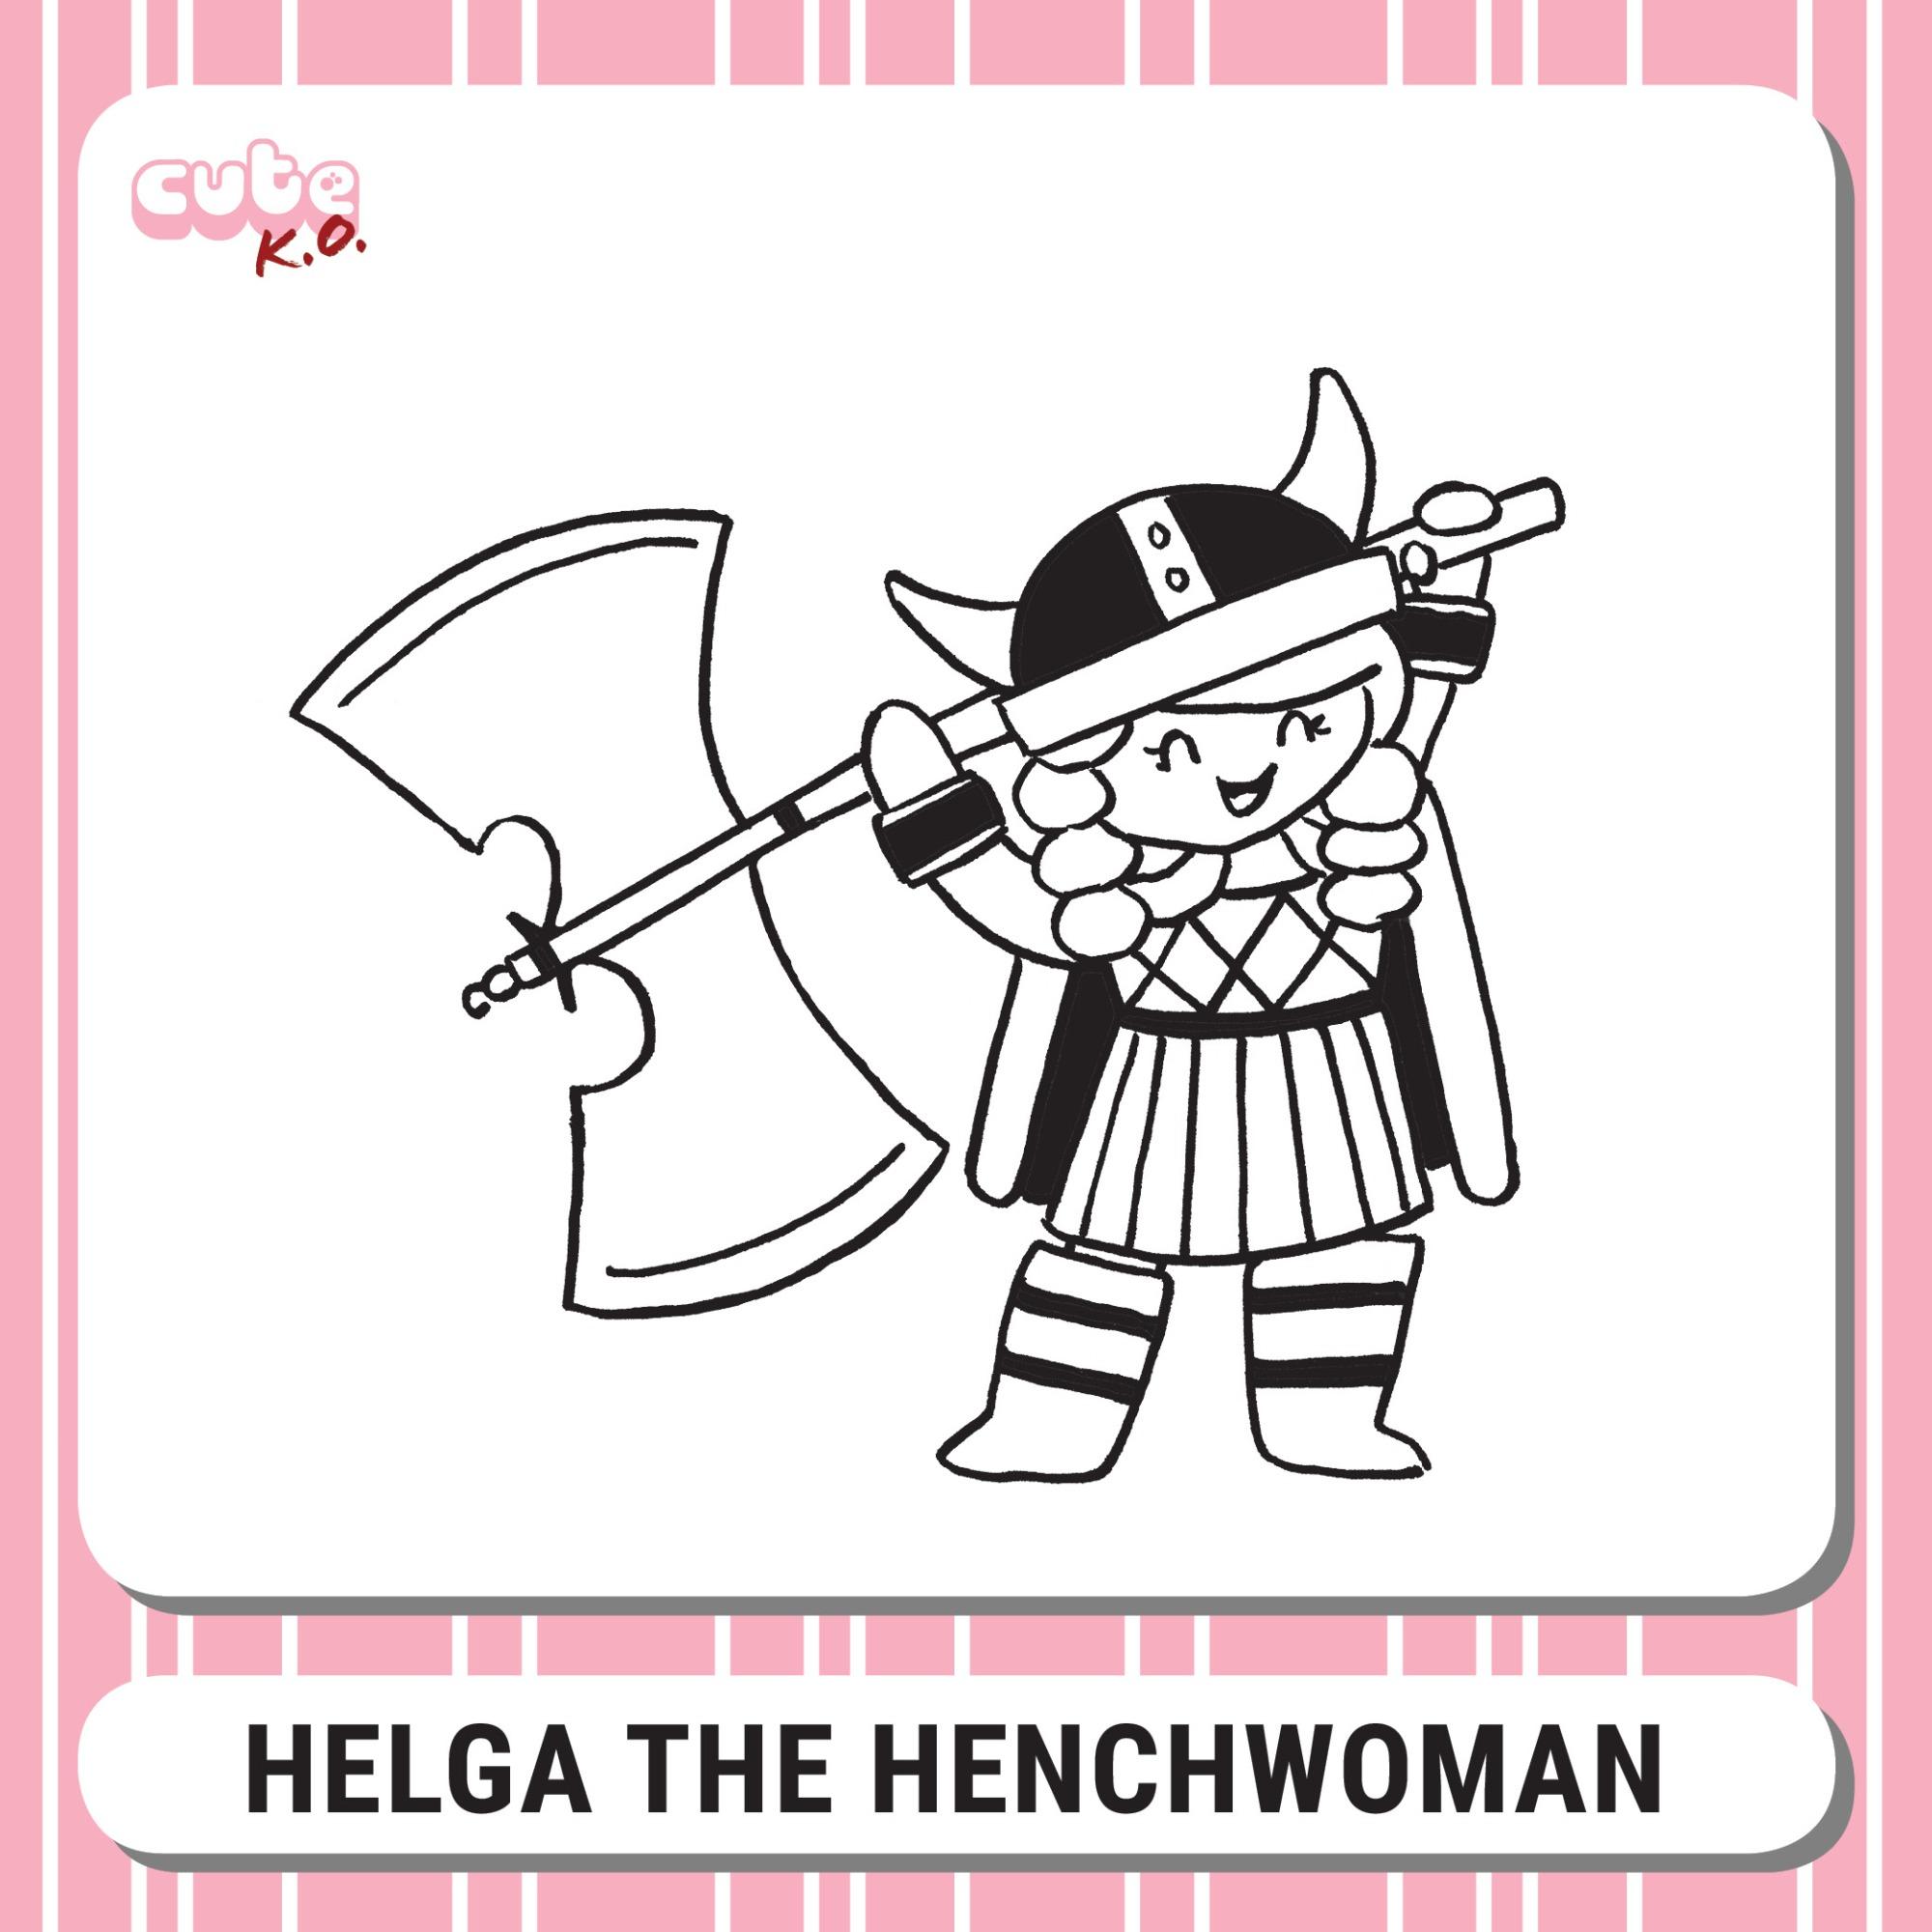 Cute K.O. 2019 Round One: Helga the Henchwoman